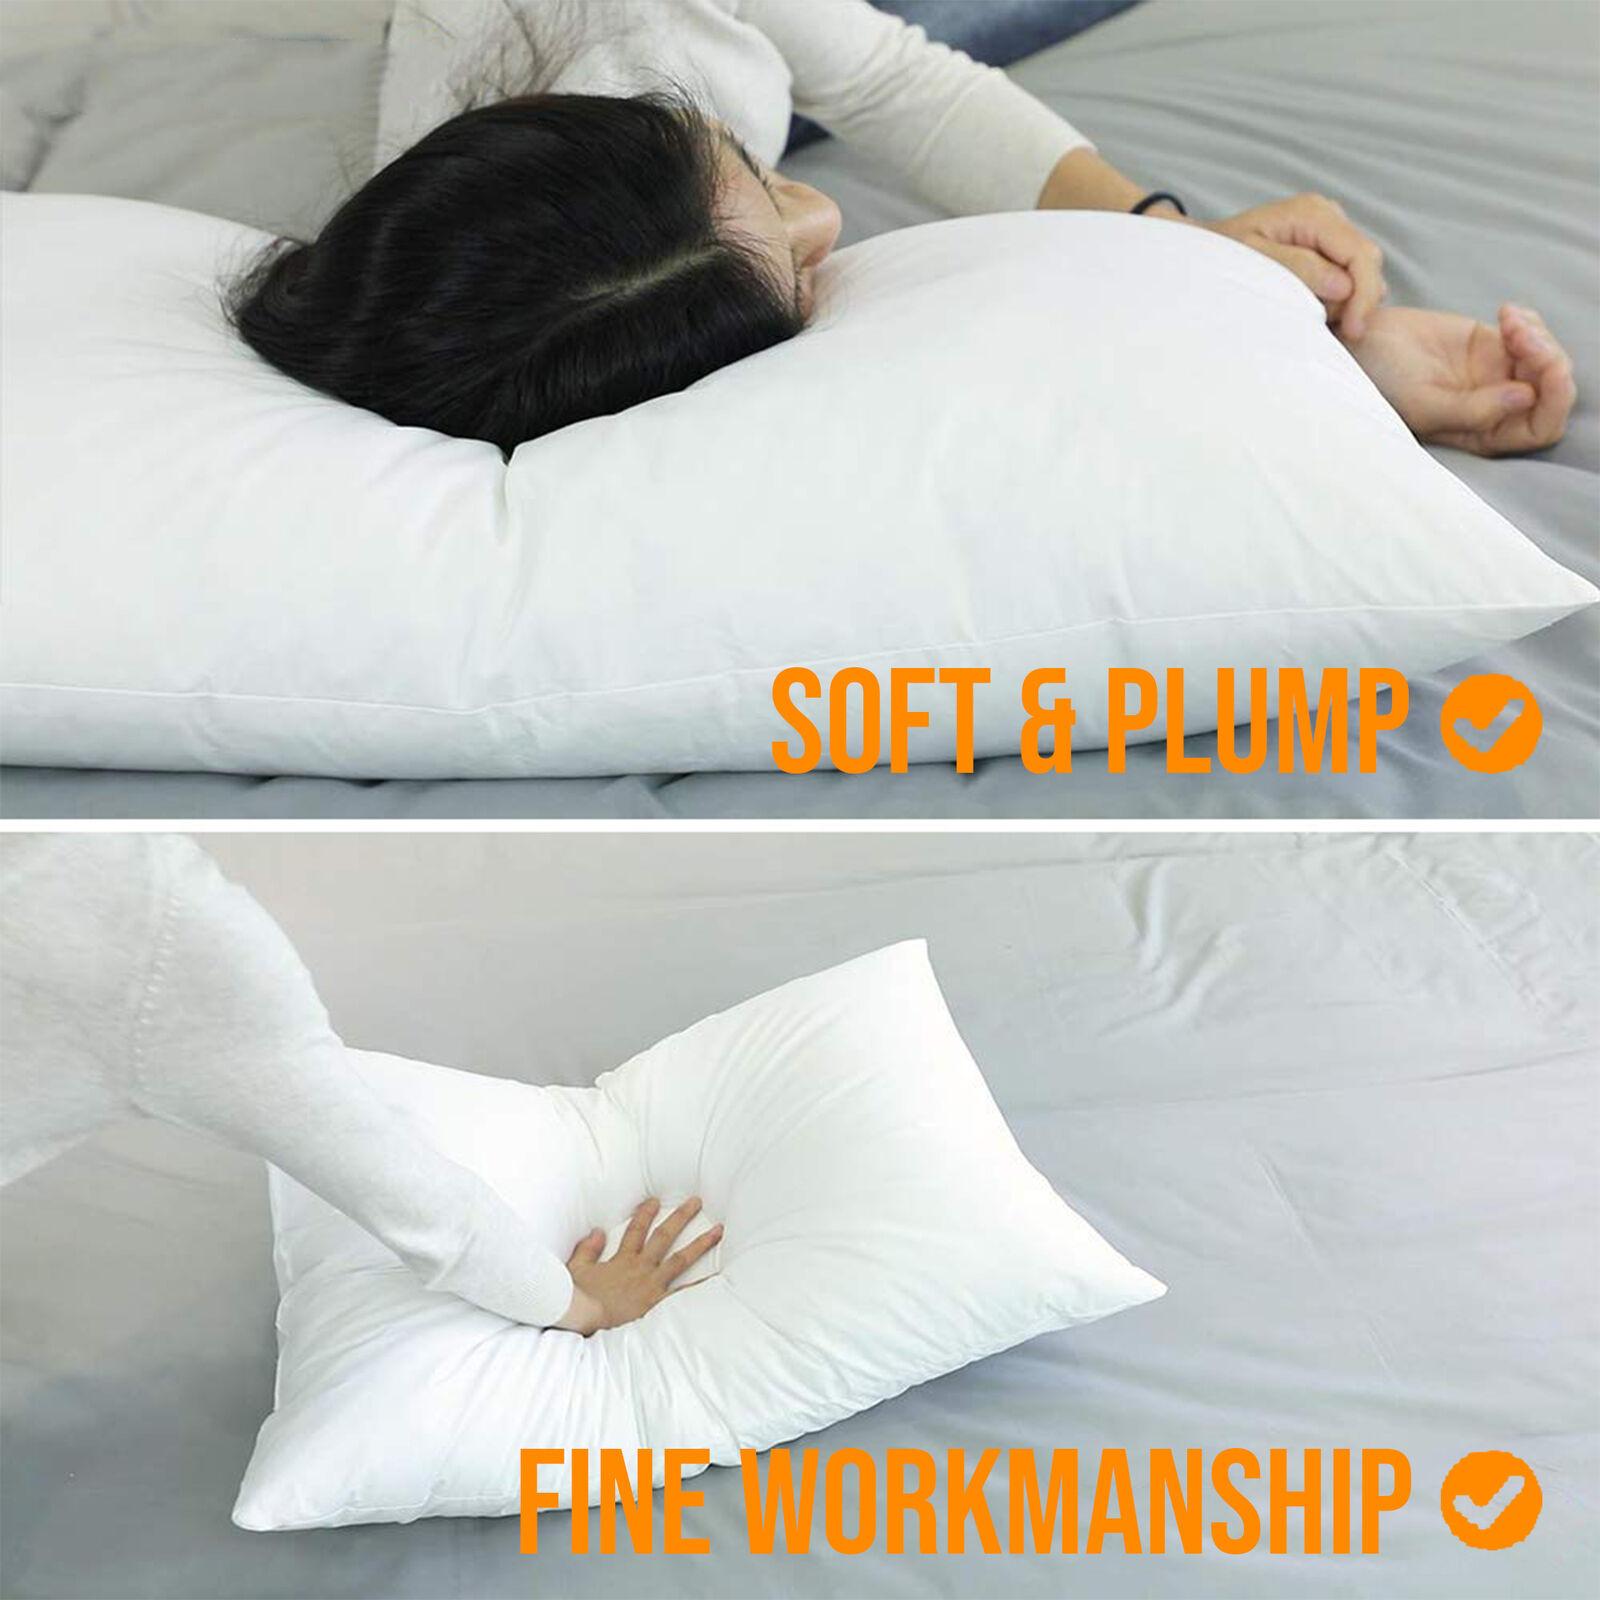 Super Bounce Back Pillows Hollow Fibre Filled Pillow 4 X Luxury Deluxe Pillows